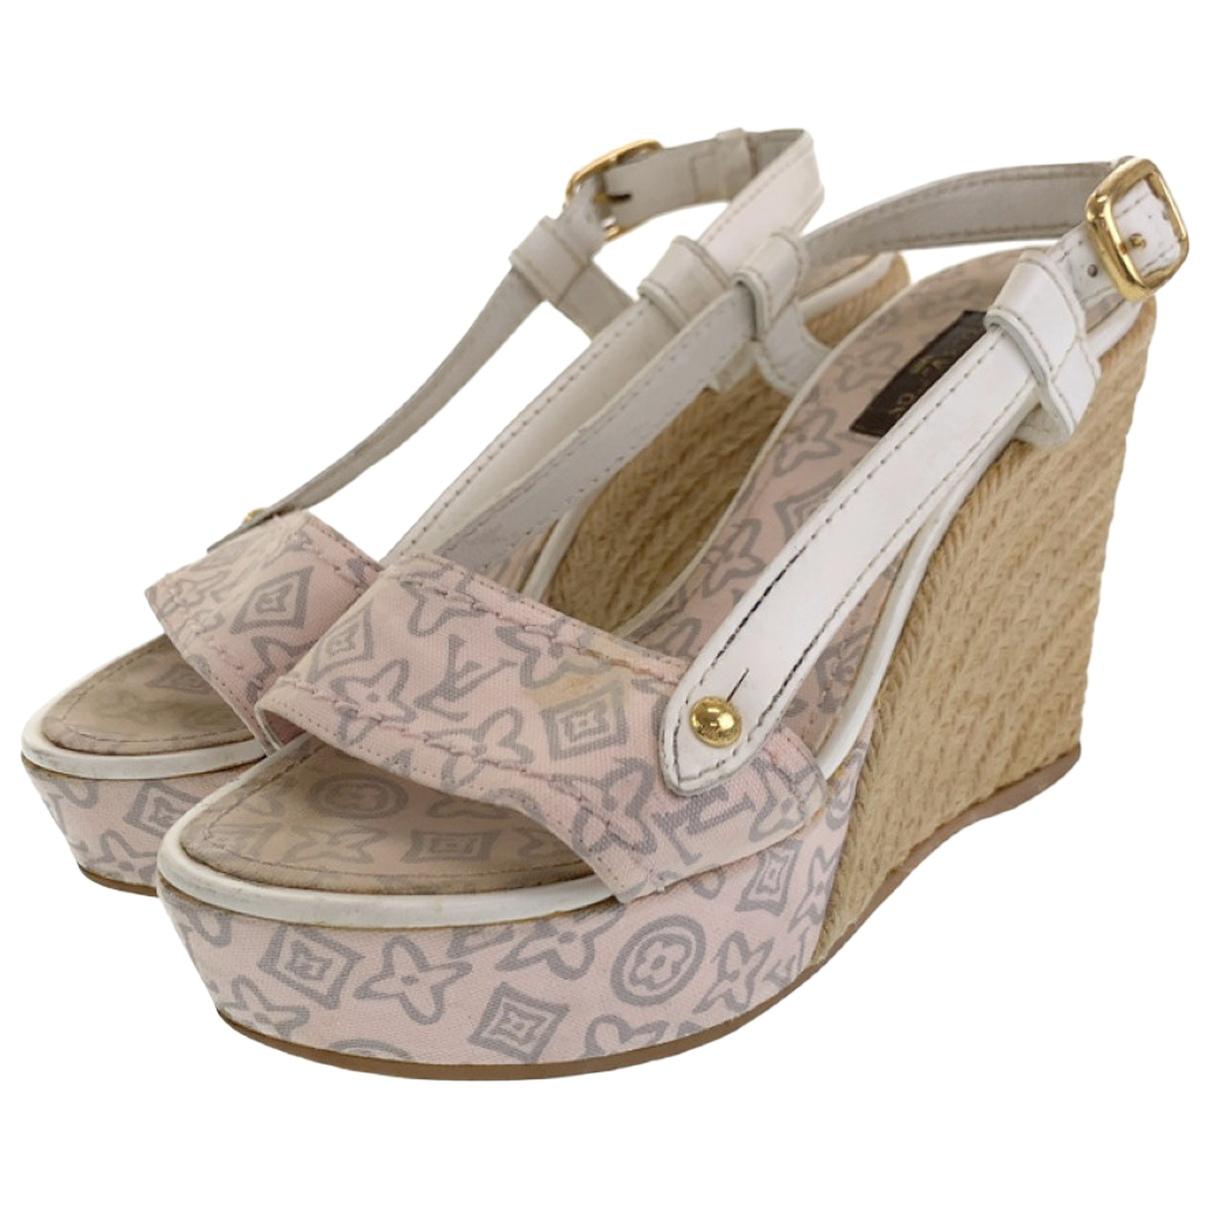 Sandalias de Cuero Louis Vuitton